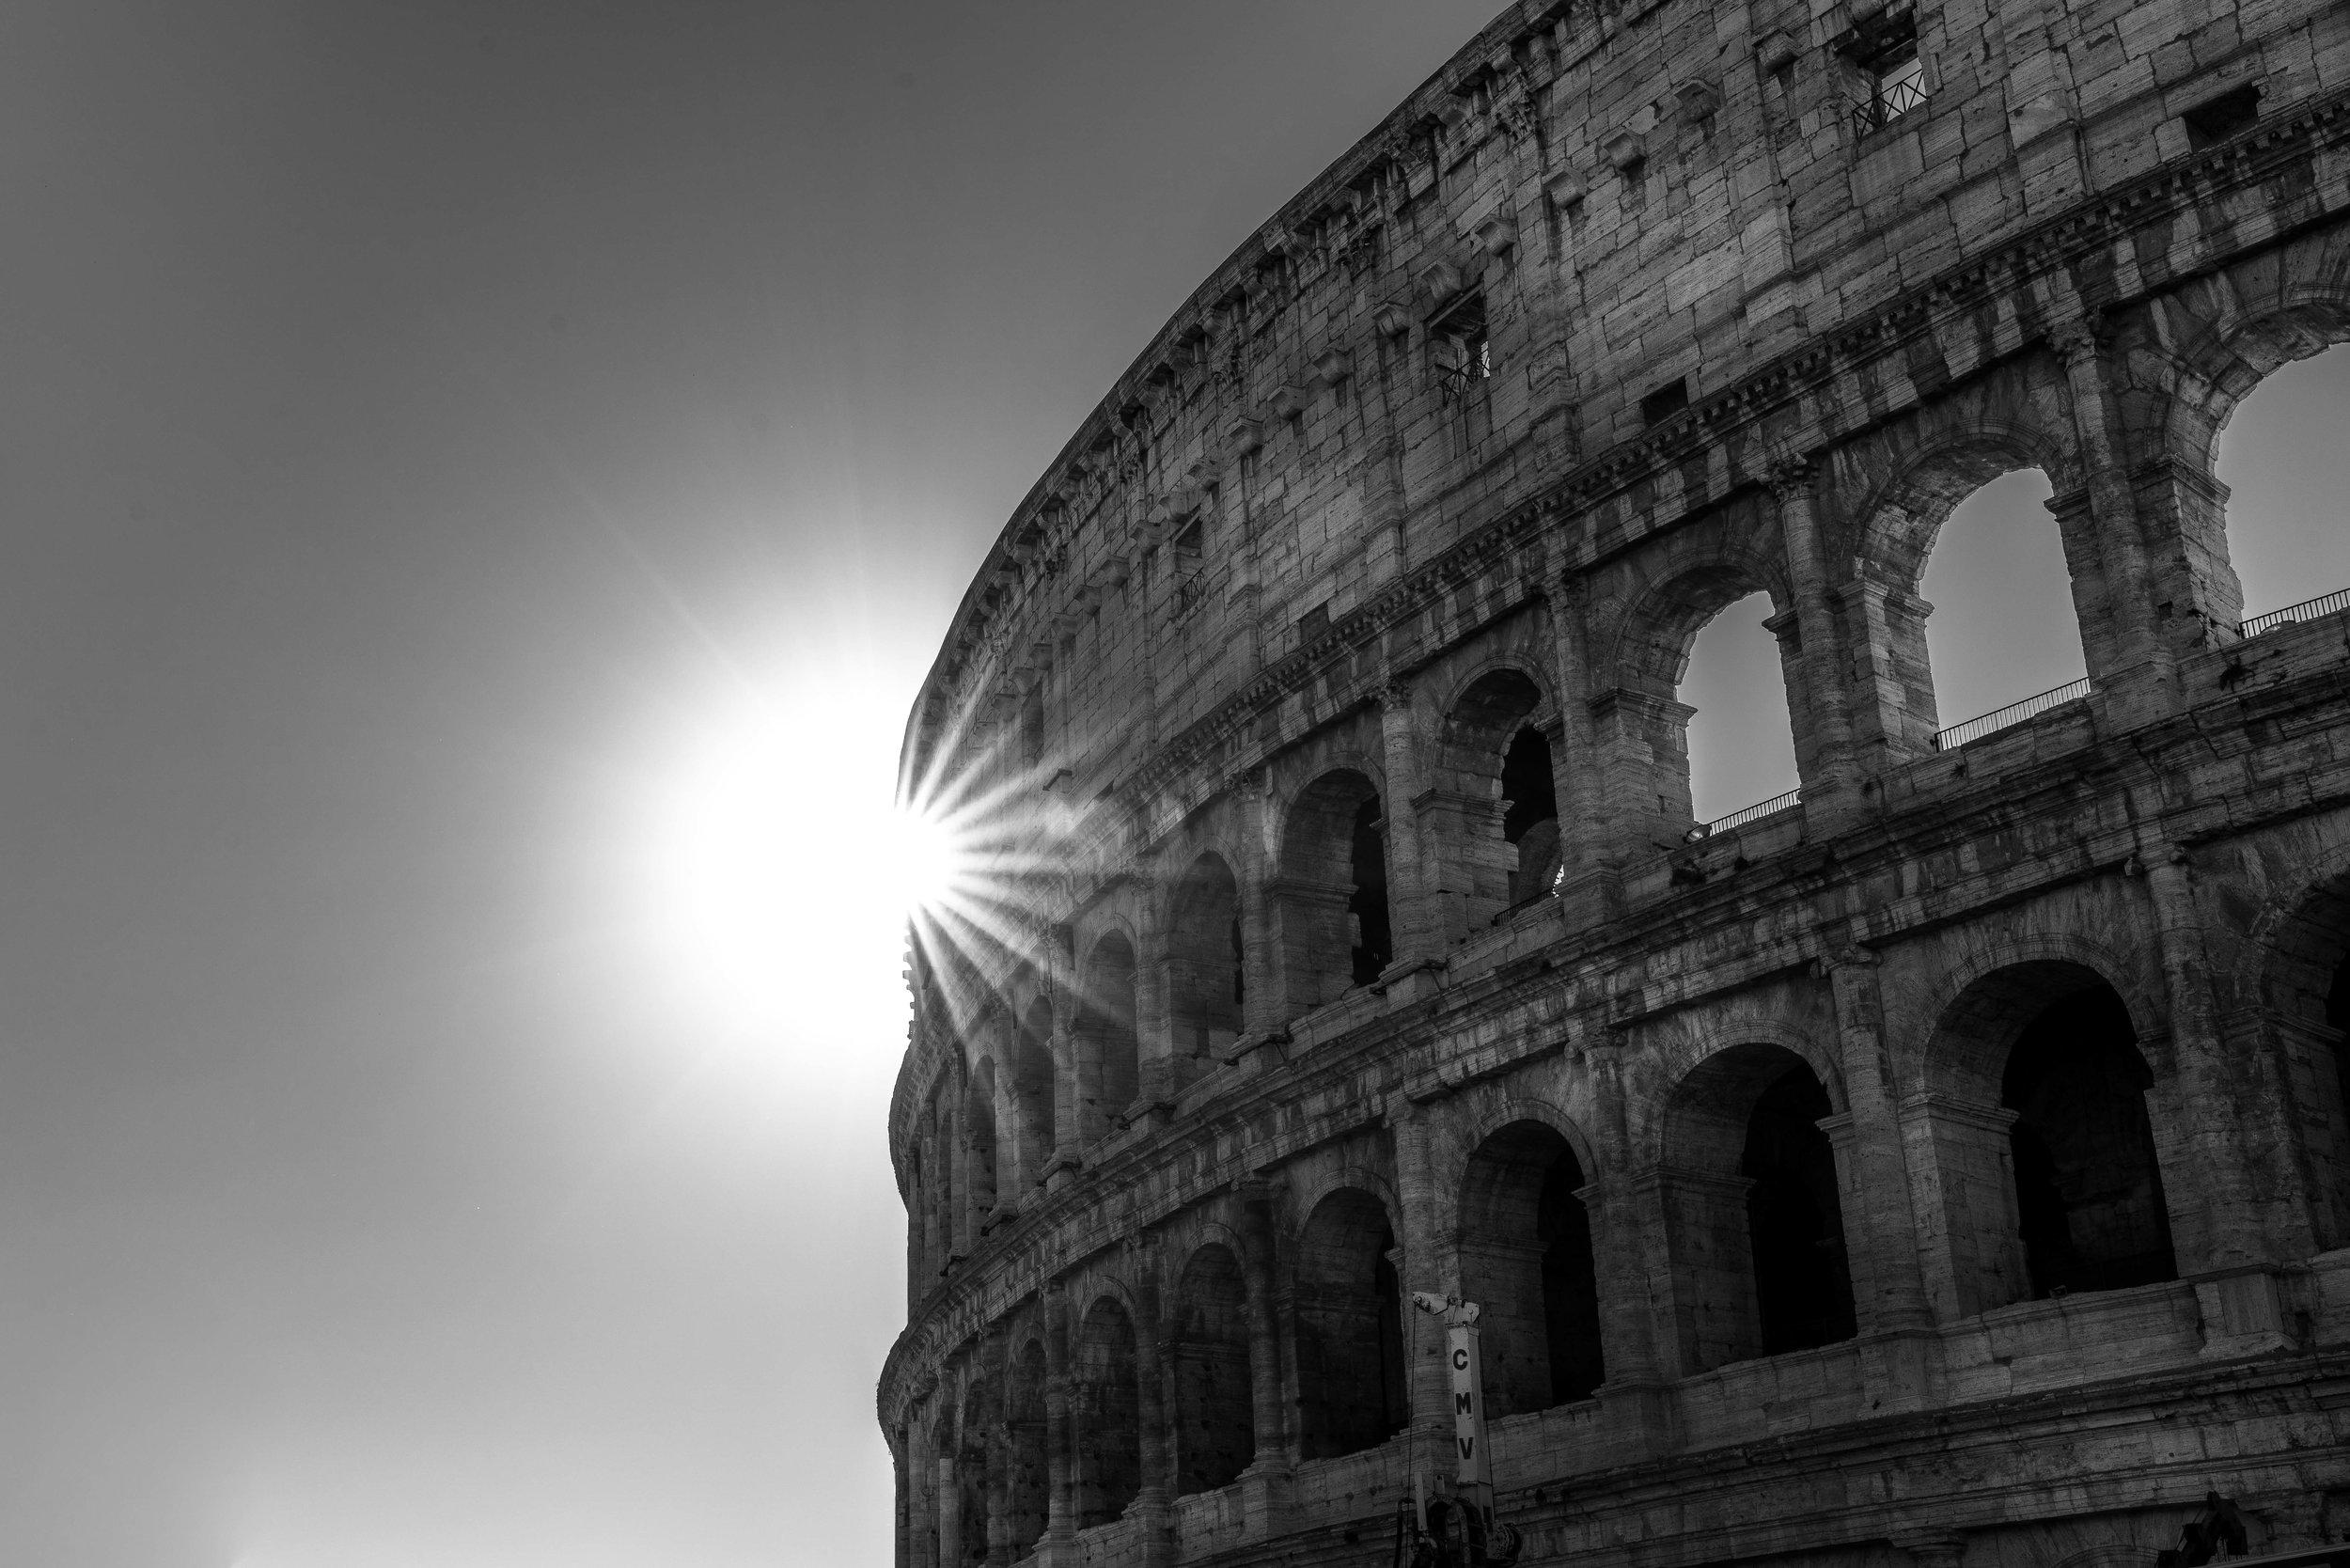 The Colosseum - Colosseo